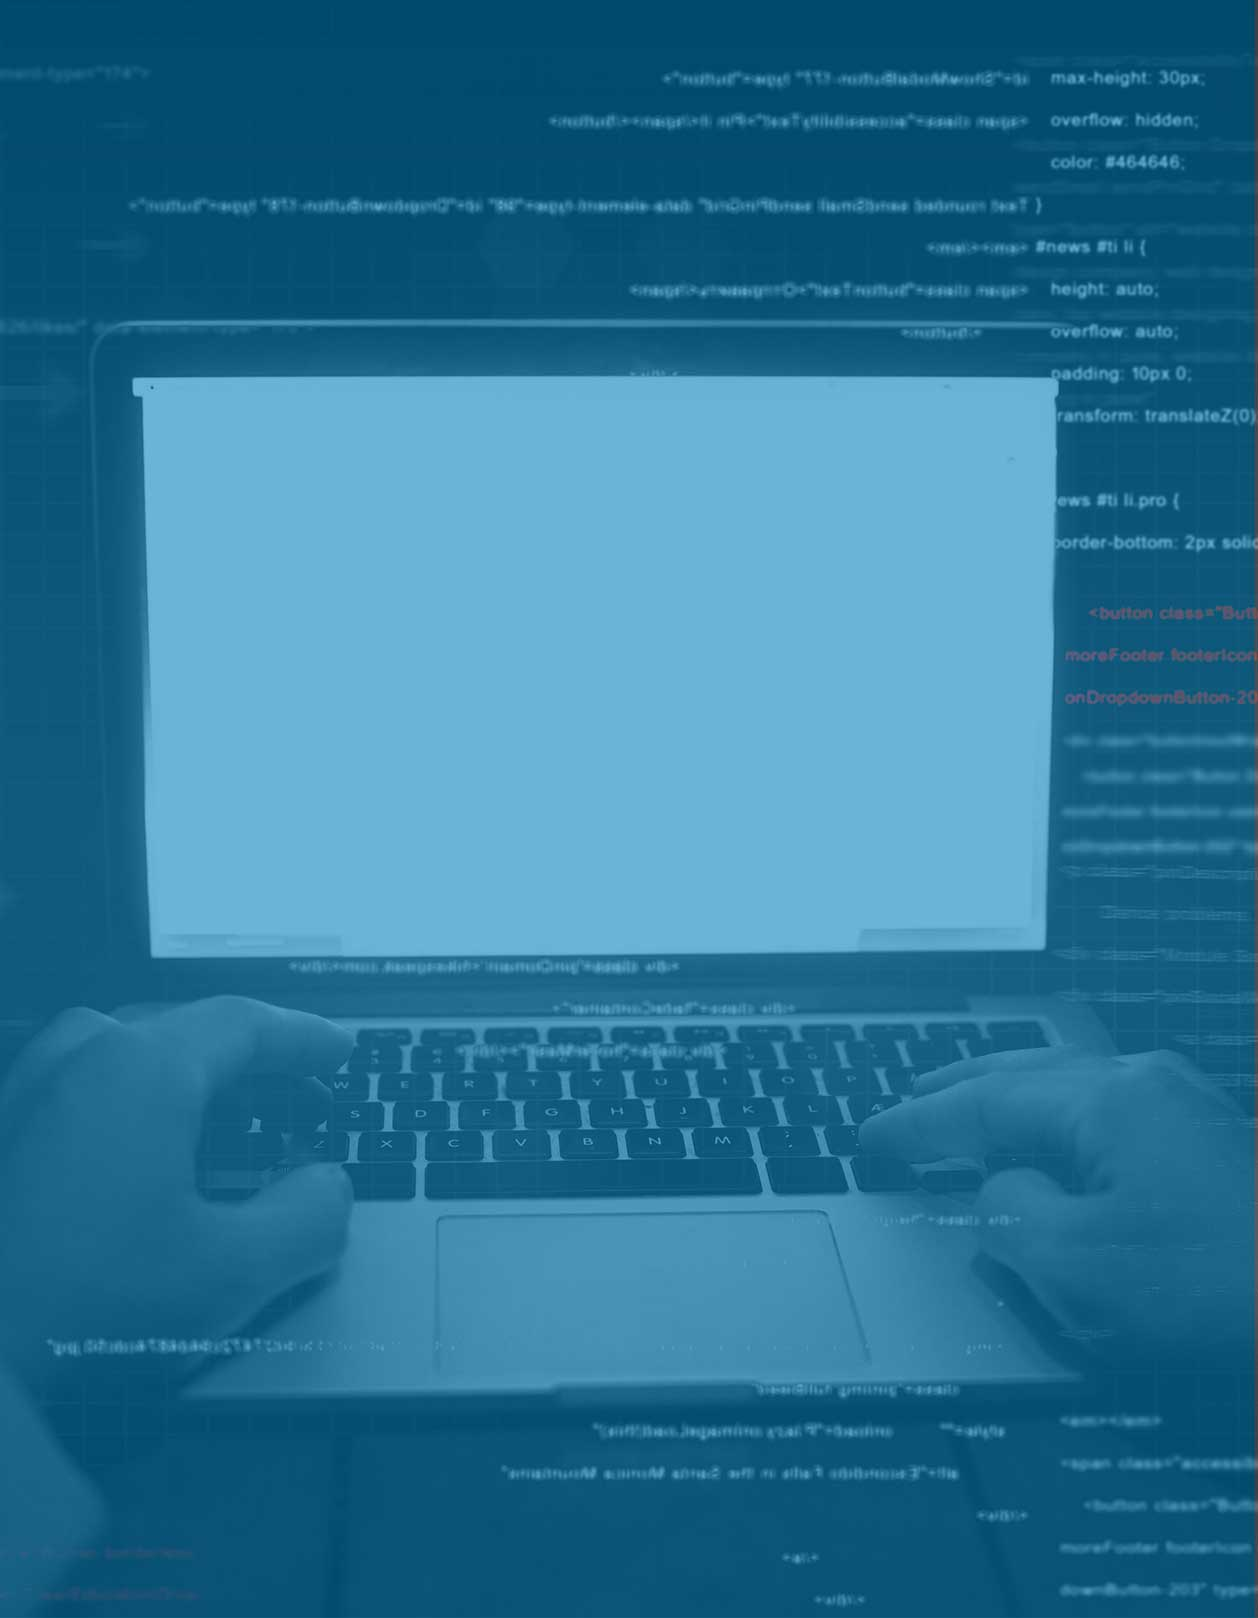 https://i1.wp.com/www.synergytechnology.it/wp-content/uploads/2019/04/informatica-1.jpg?fit=1258%2C1618&ssl=1